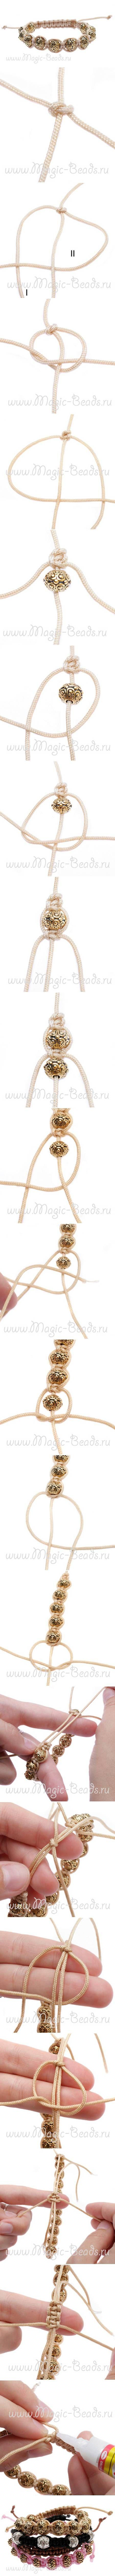 DIY Shambhala Bracelet DIY Shambhala Bracelet